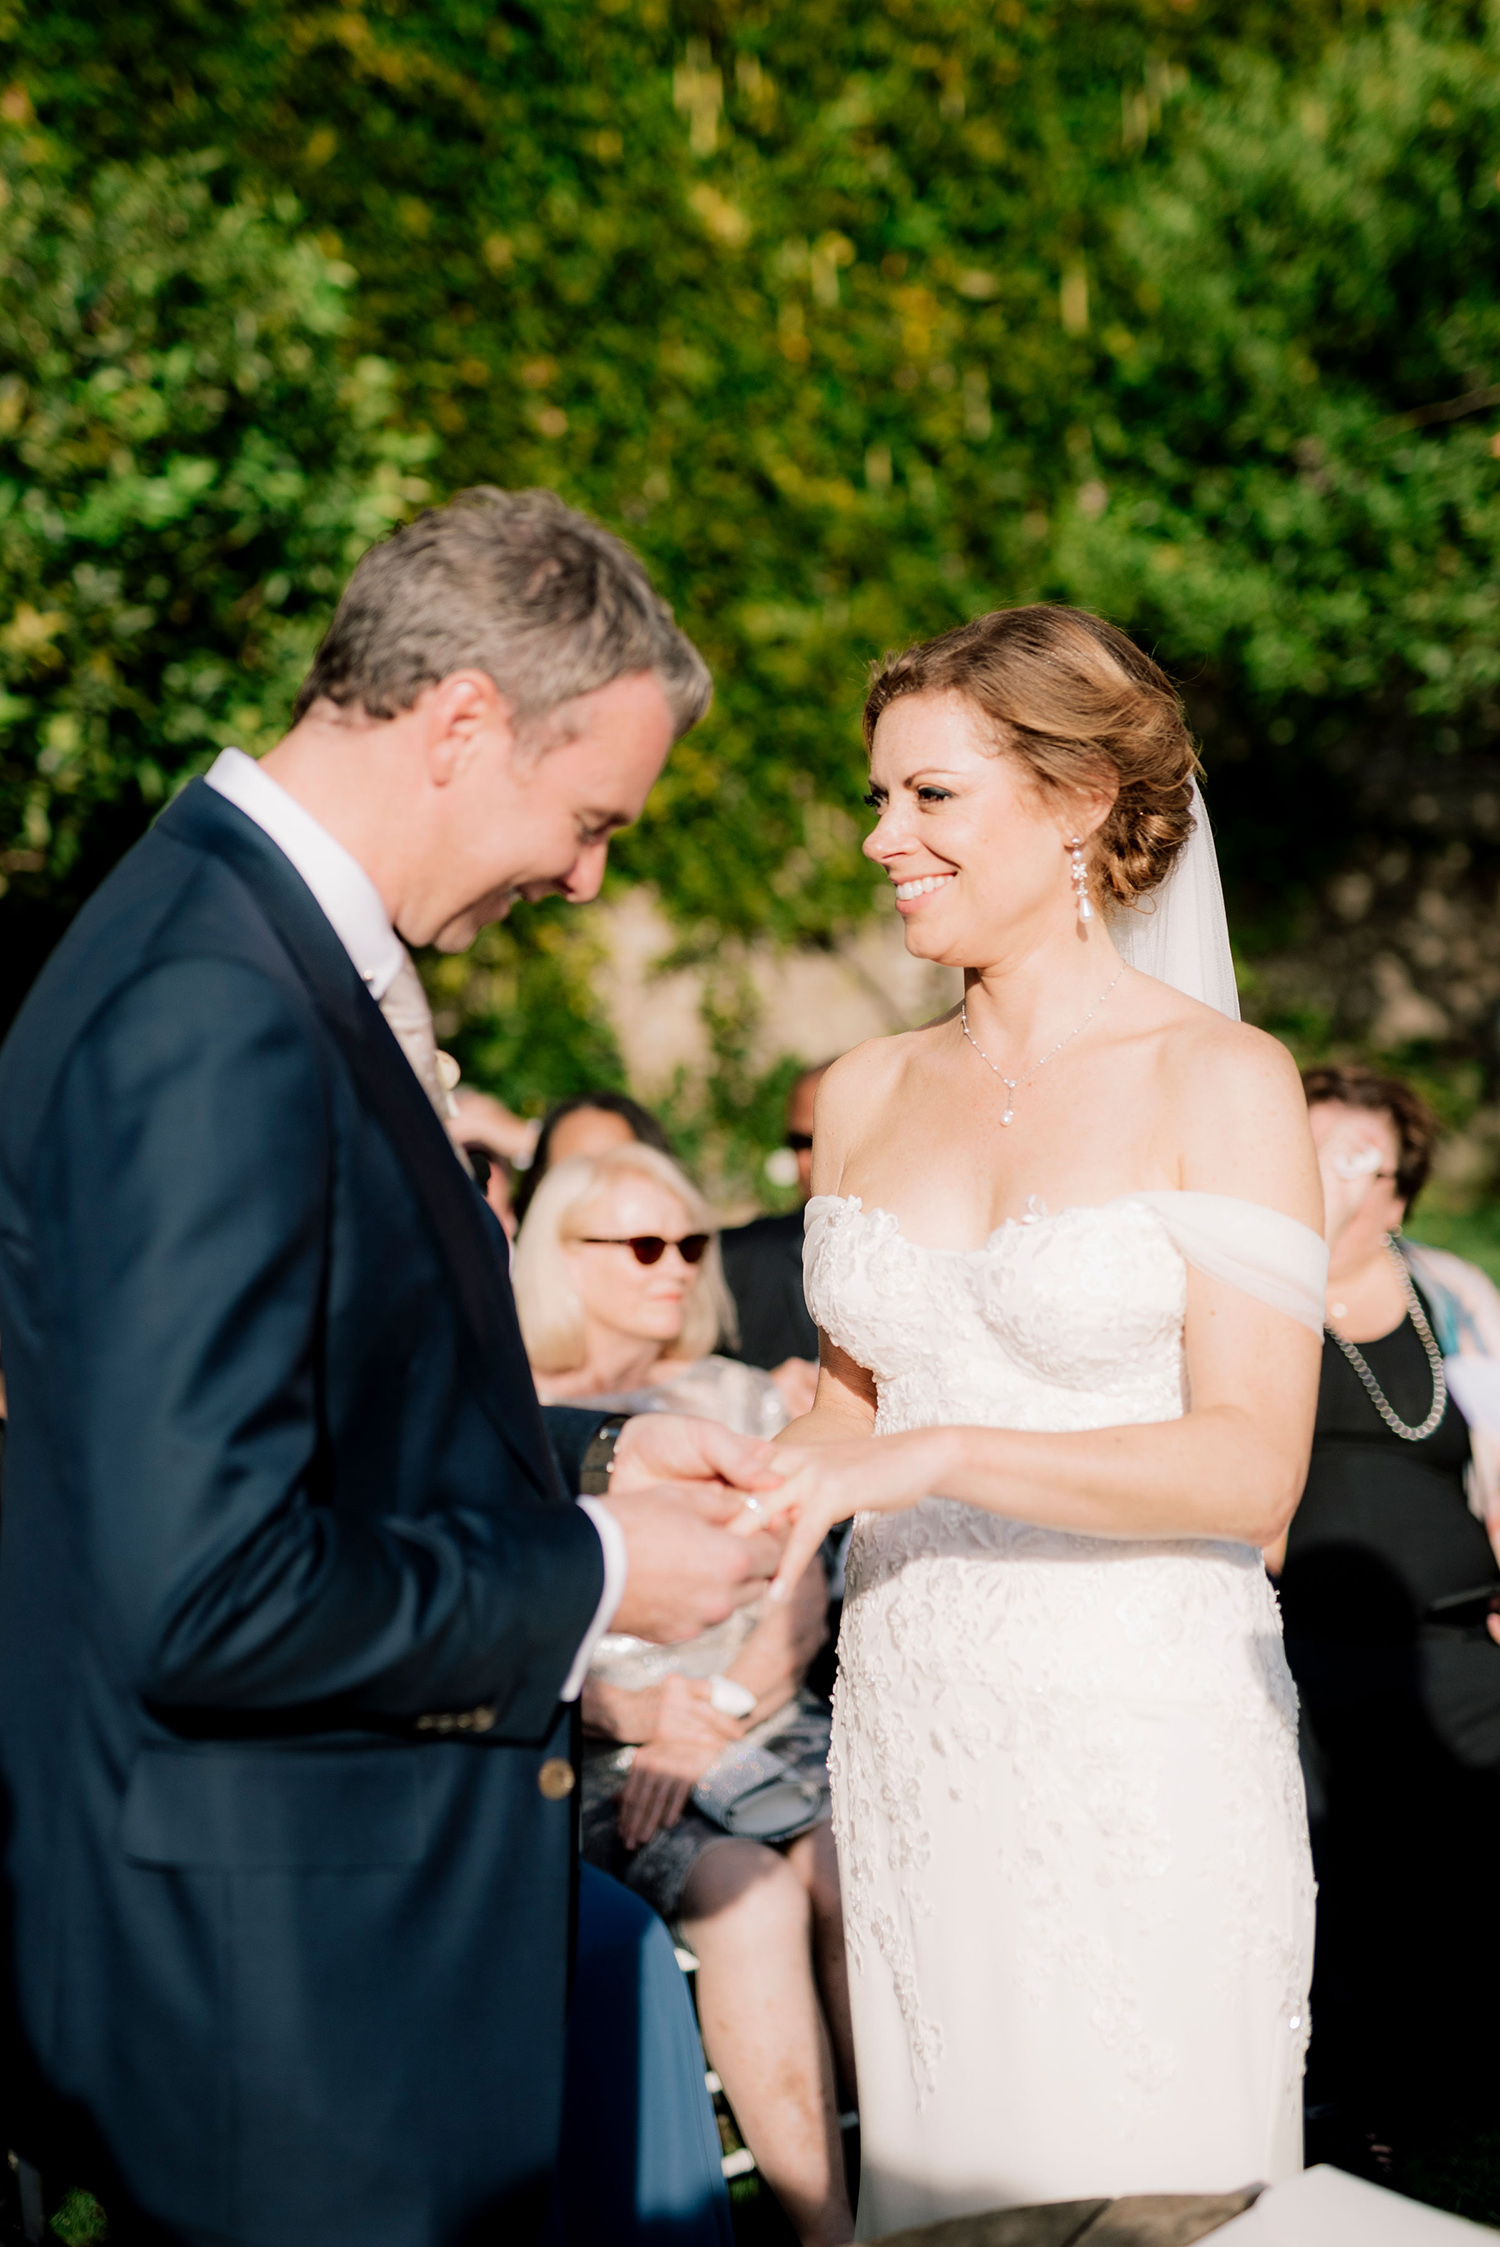 cara david wedding ceremony rings